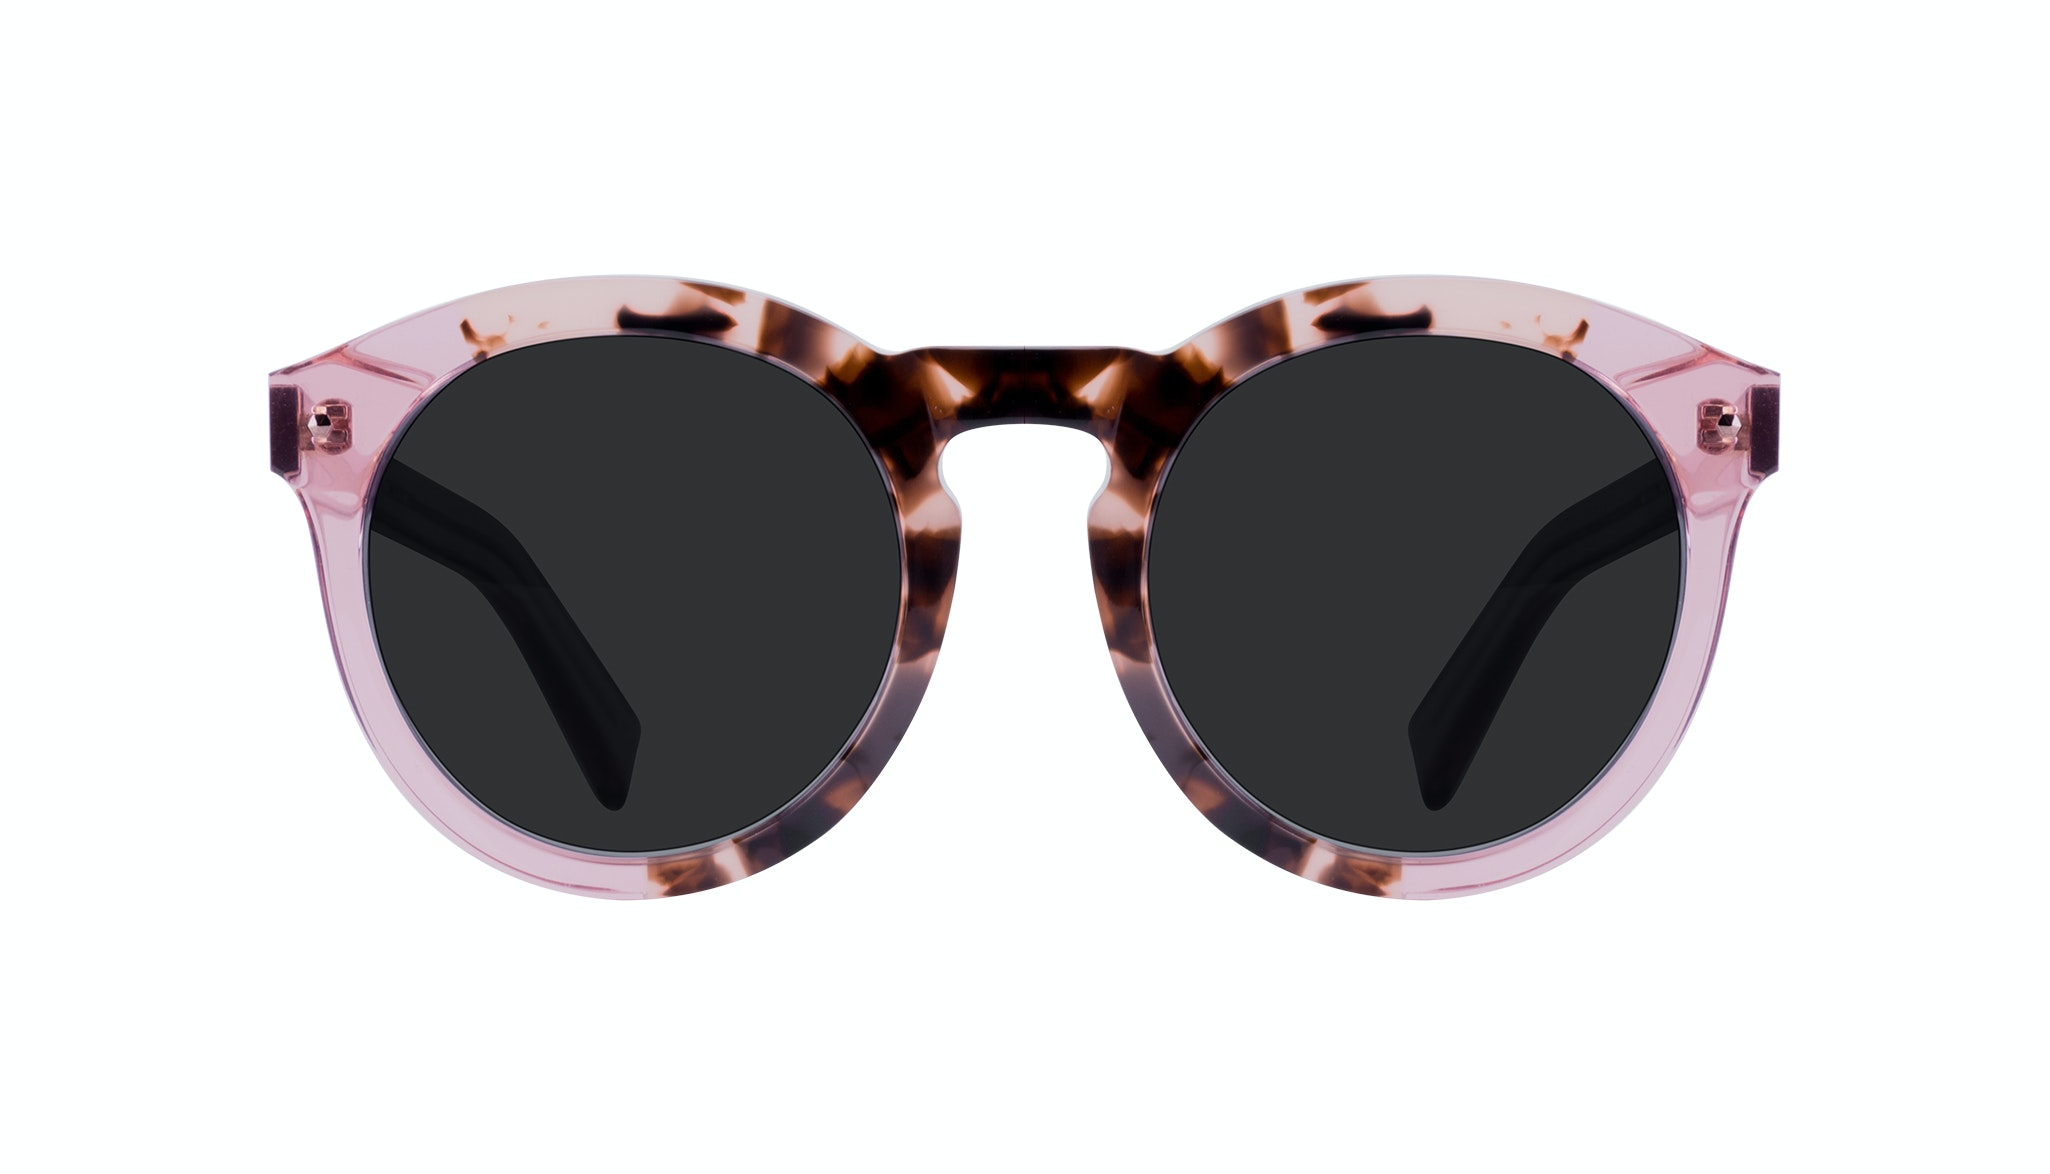 Affordable Fashion Glasses Round Sunglasses Women Mood Blush Tortoise